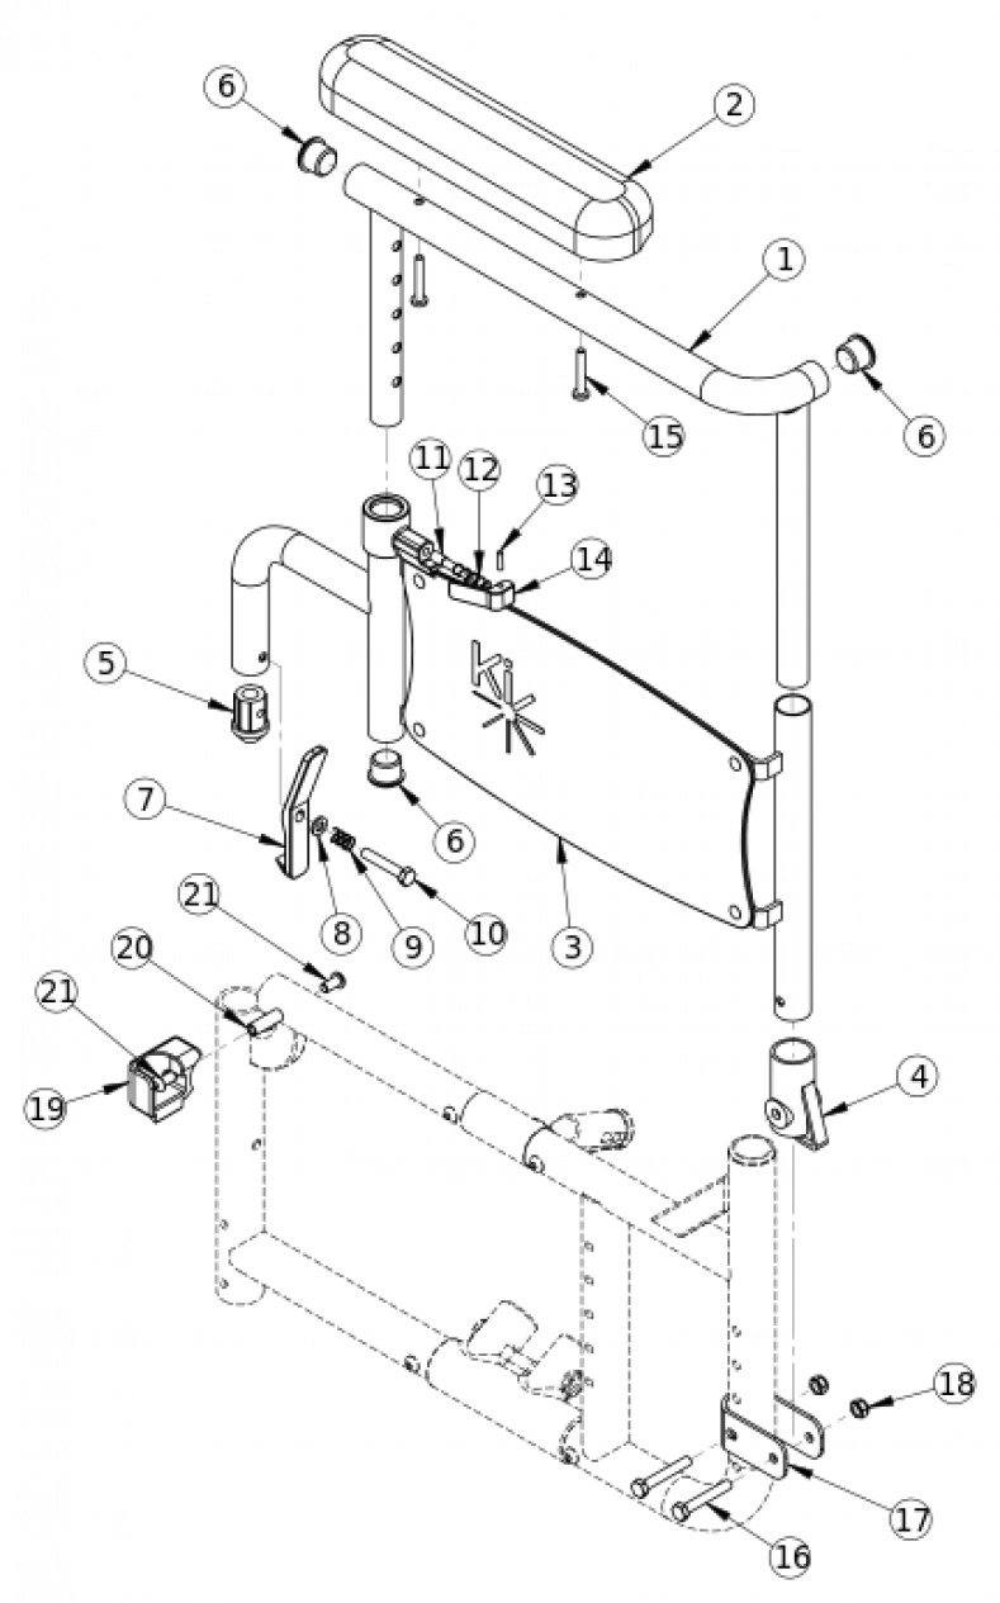 Discontinued Catalyst 5 Height Adjustable Flip Back Armrest parts diagram